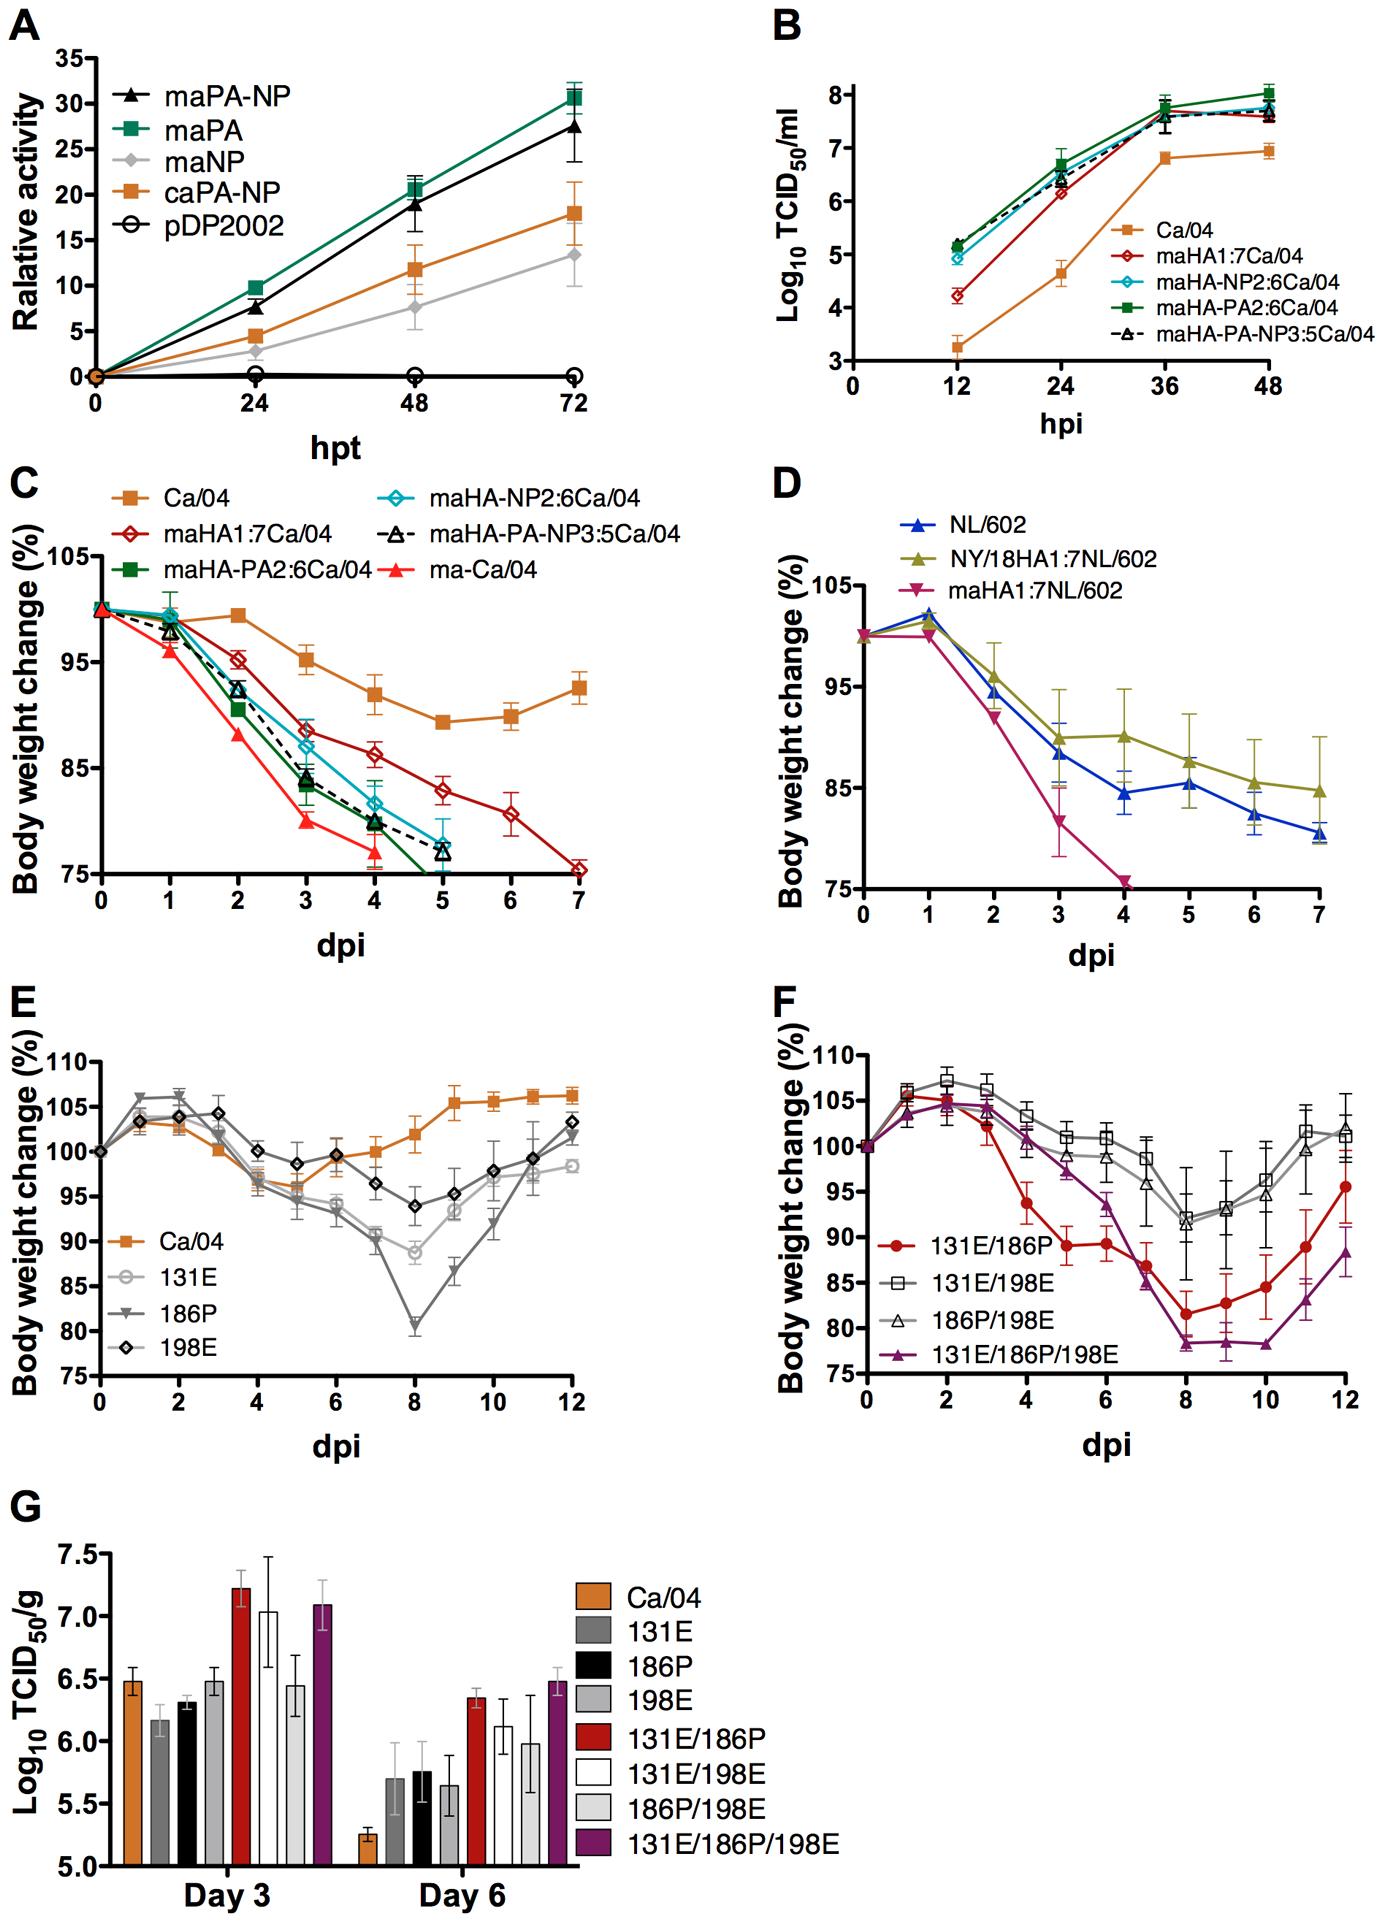 Effects of amino acid mutations for virulence of ma-Ca/04.